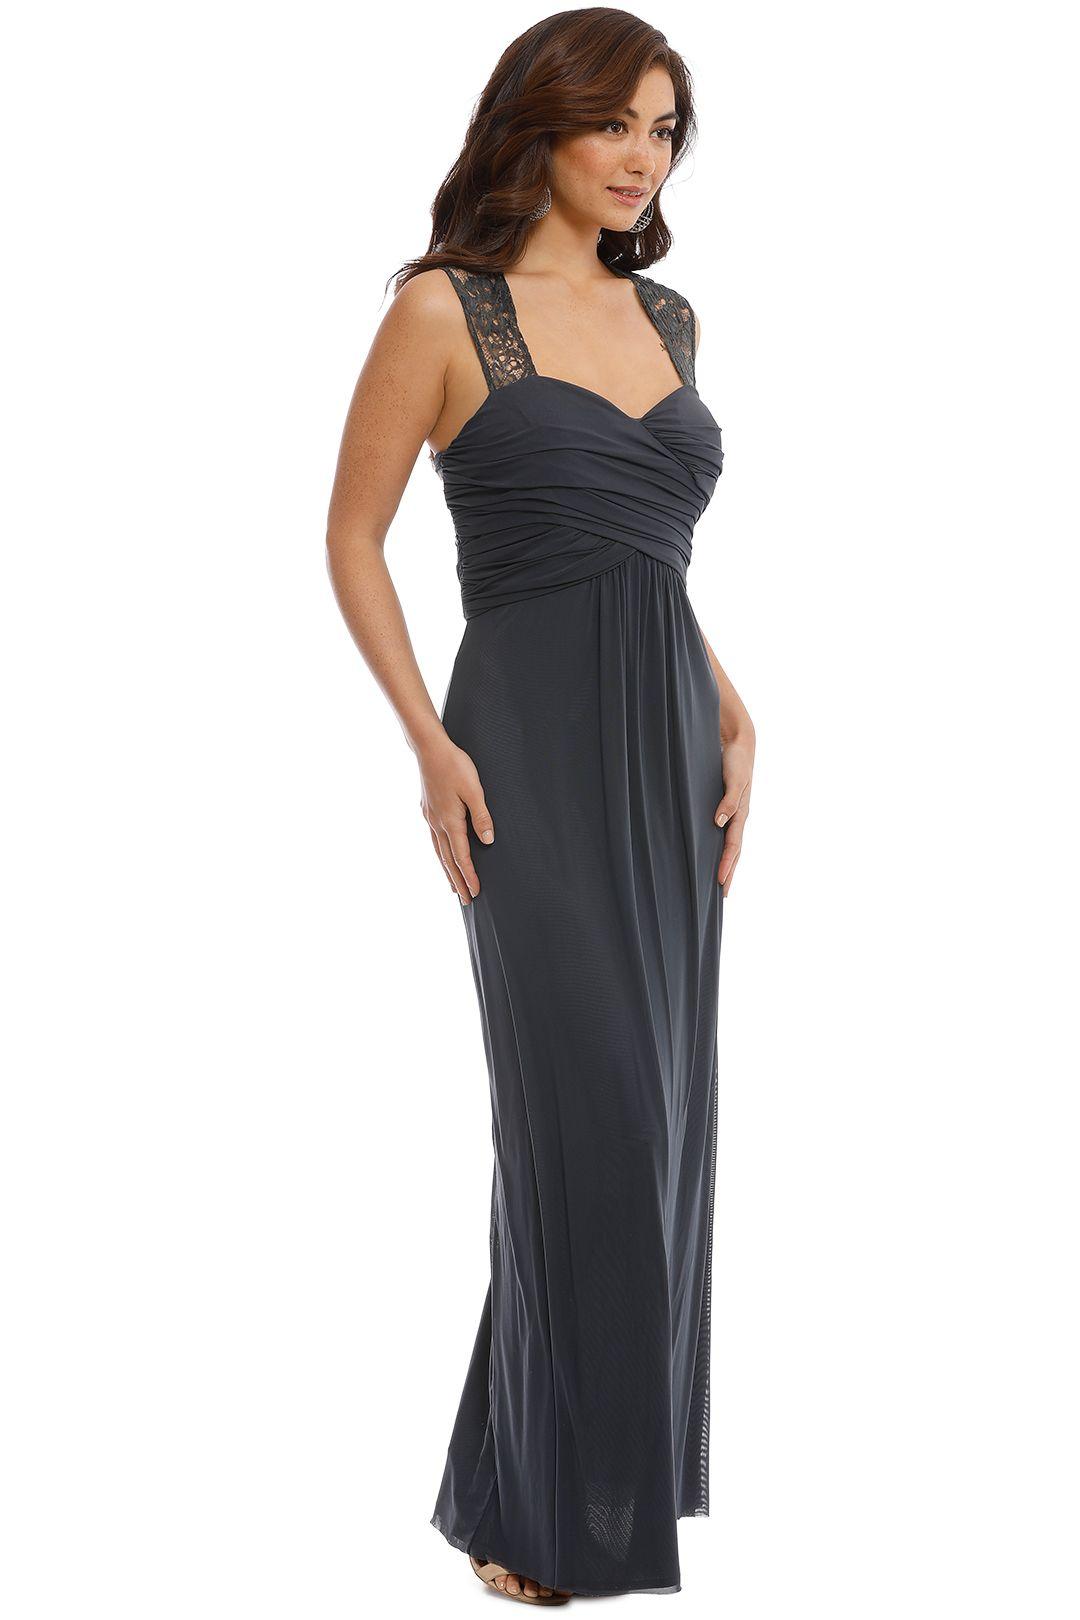 Langhem - Monet Gown - Grey - Side